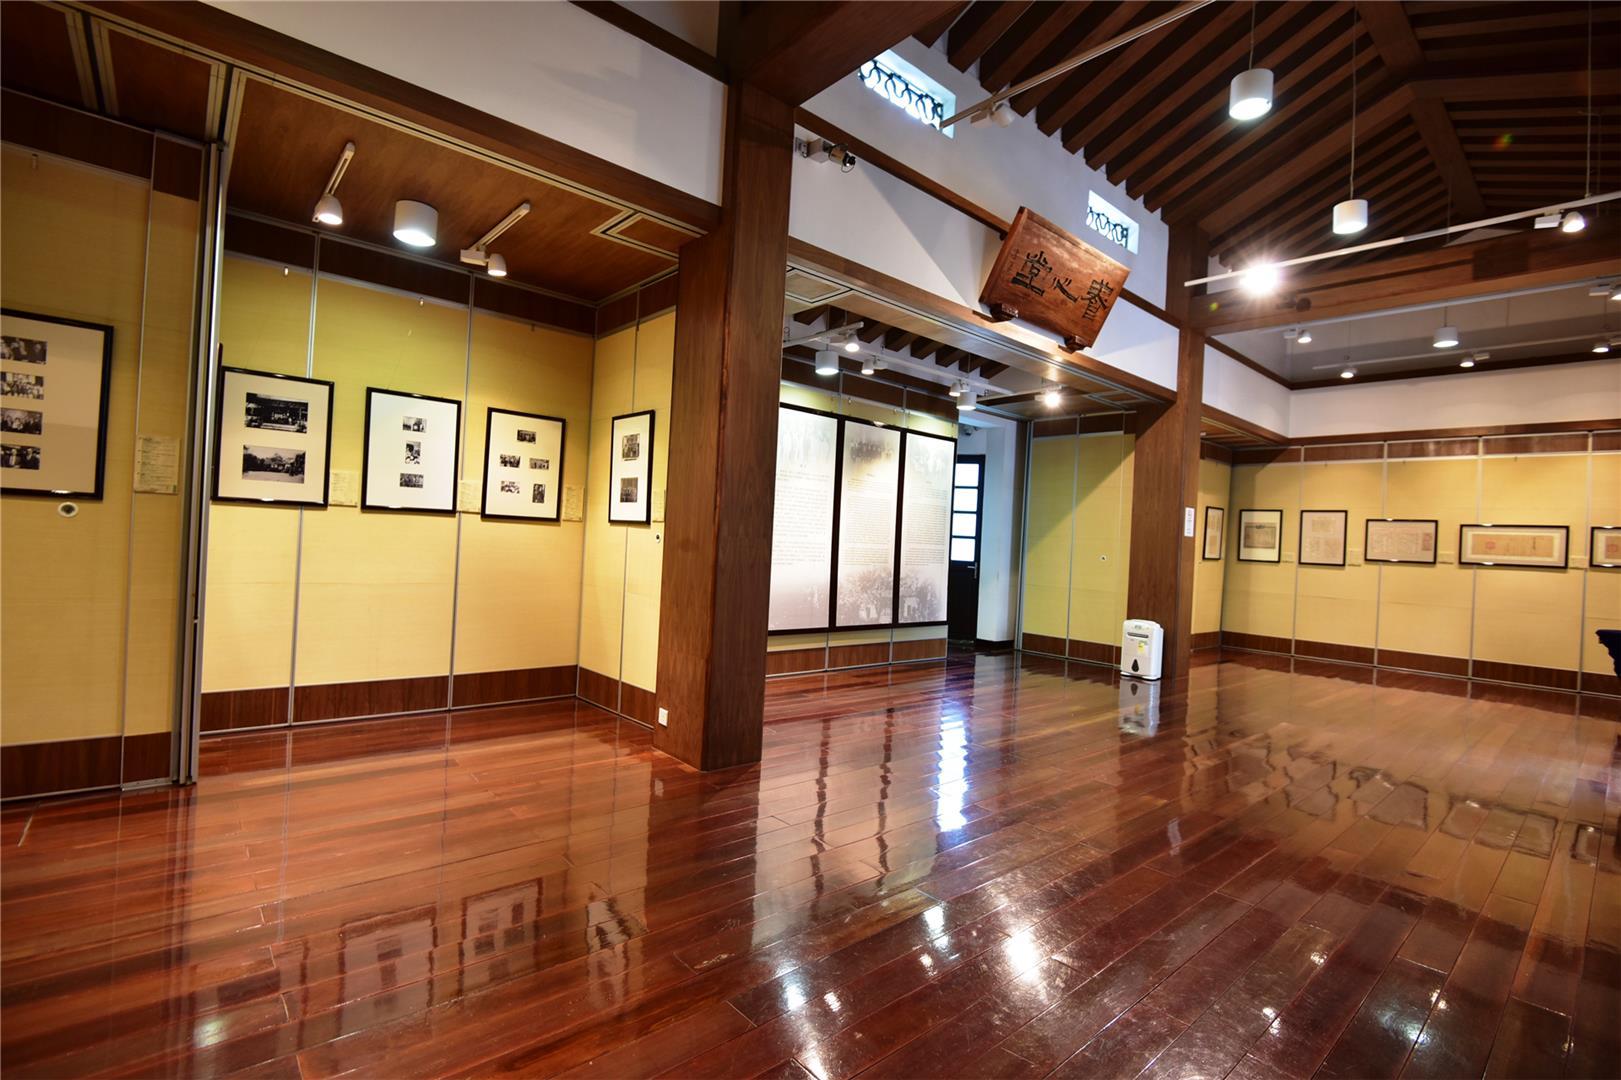 Iong Sam Tong Pavilion of Lou Lim Ioc Park (Temporarily closed)